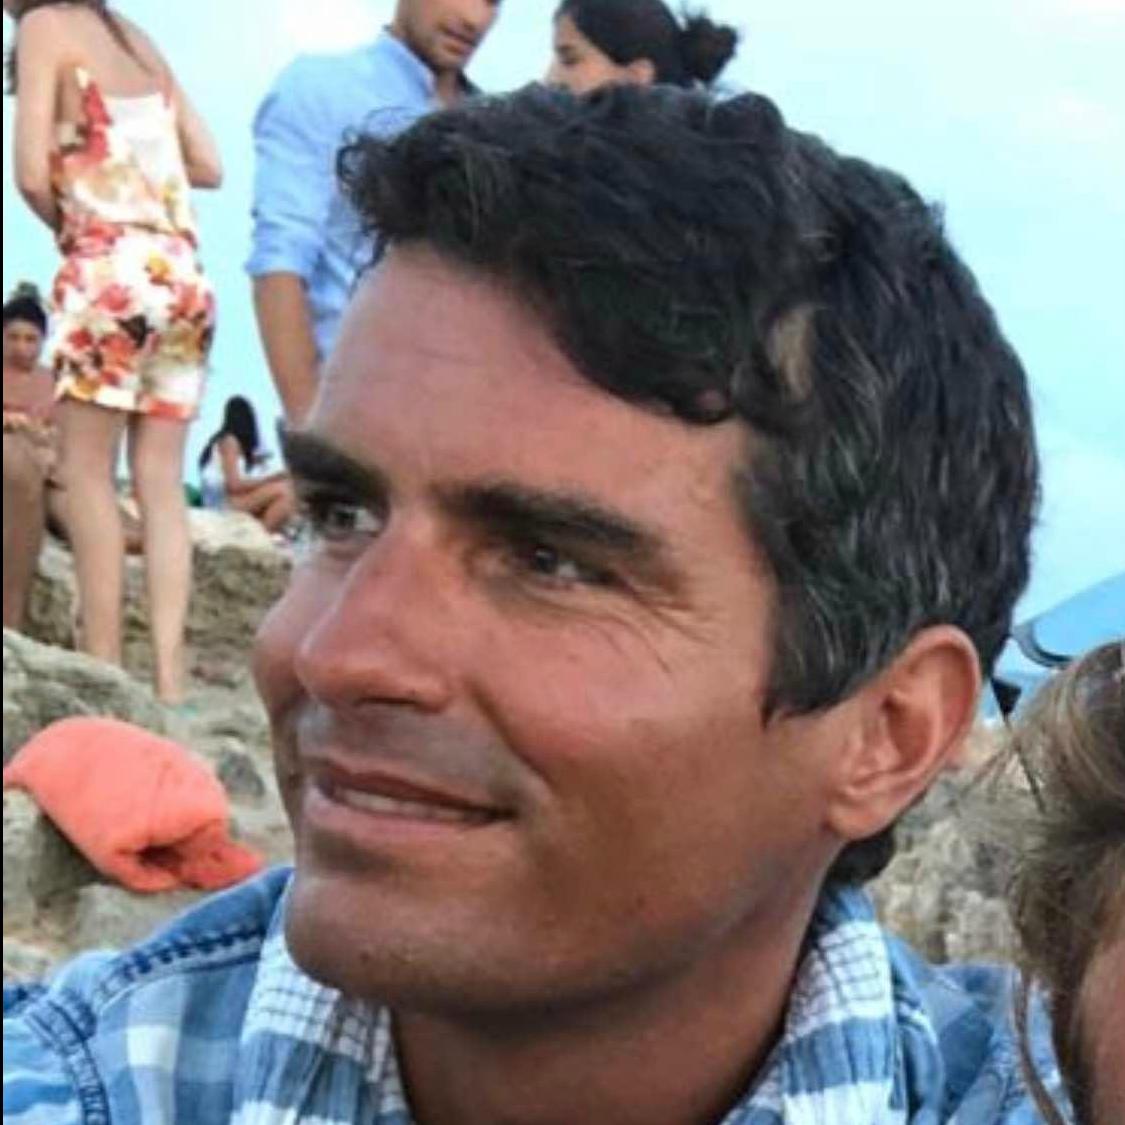 Pietro Dalmasso